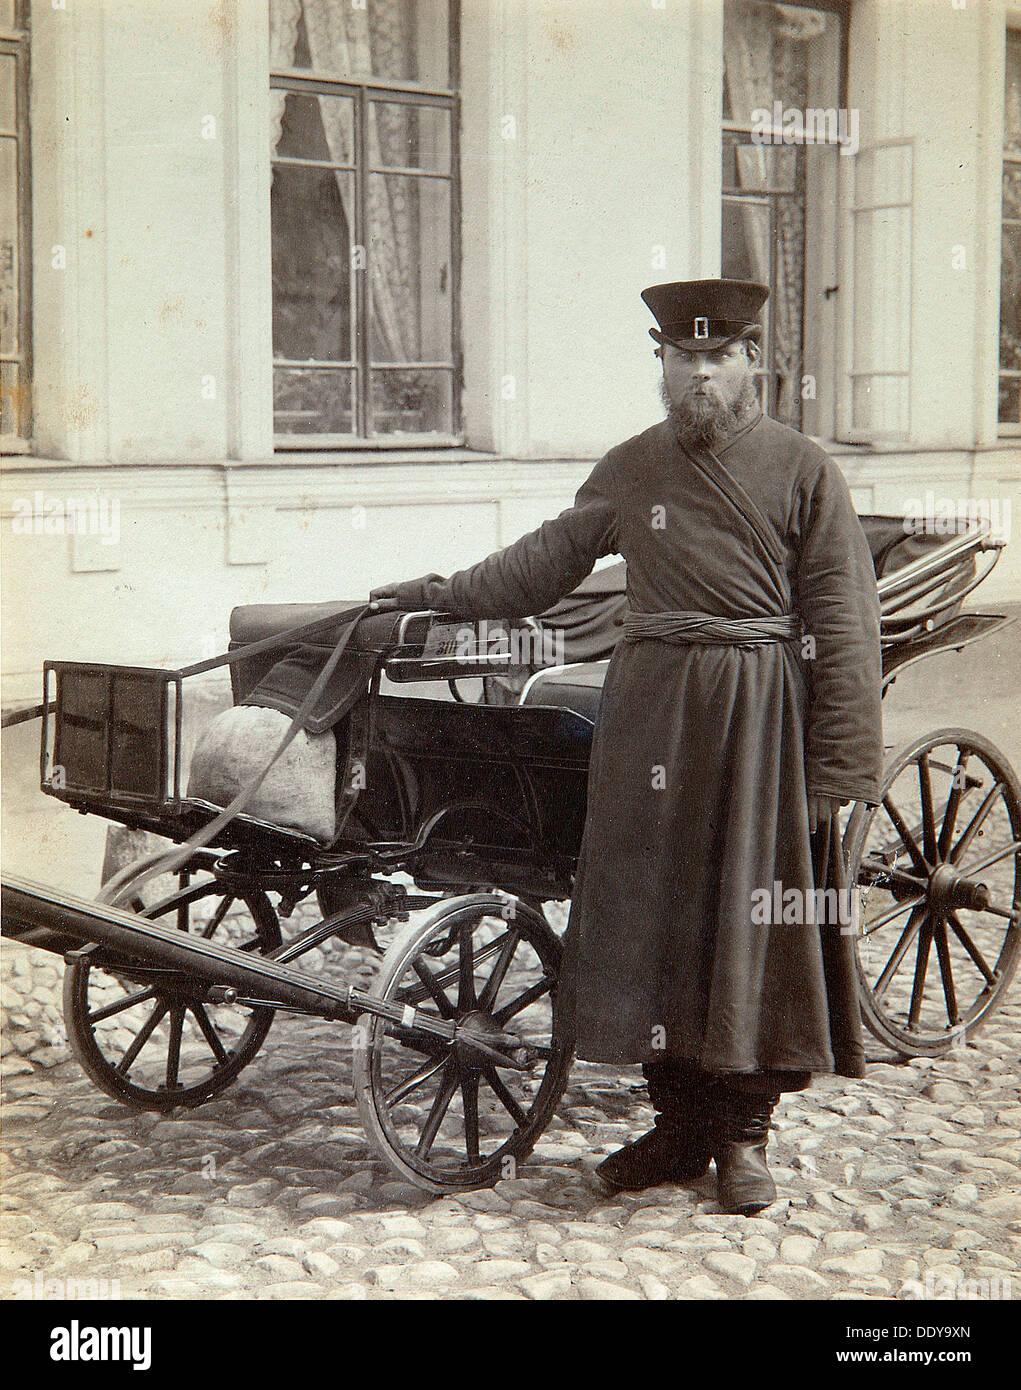 A coachman, 1890s.  Artist: Alexei Sergeevich Mazurin - Stock Image